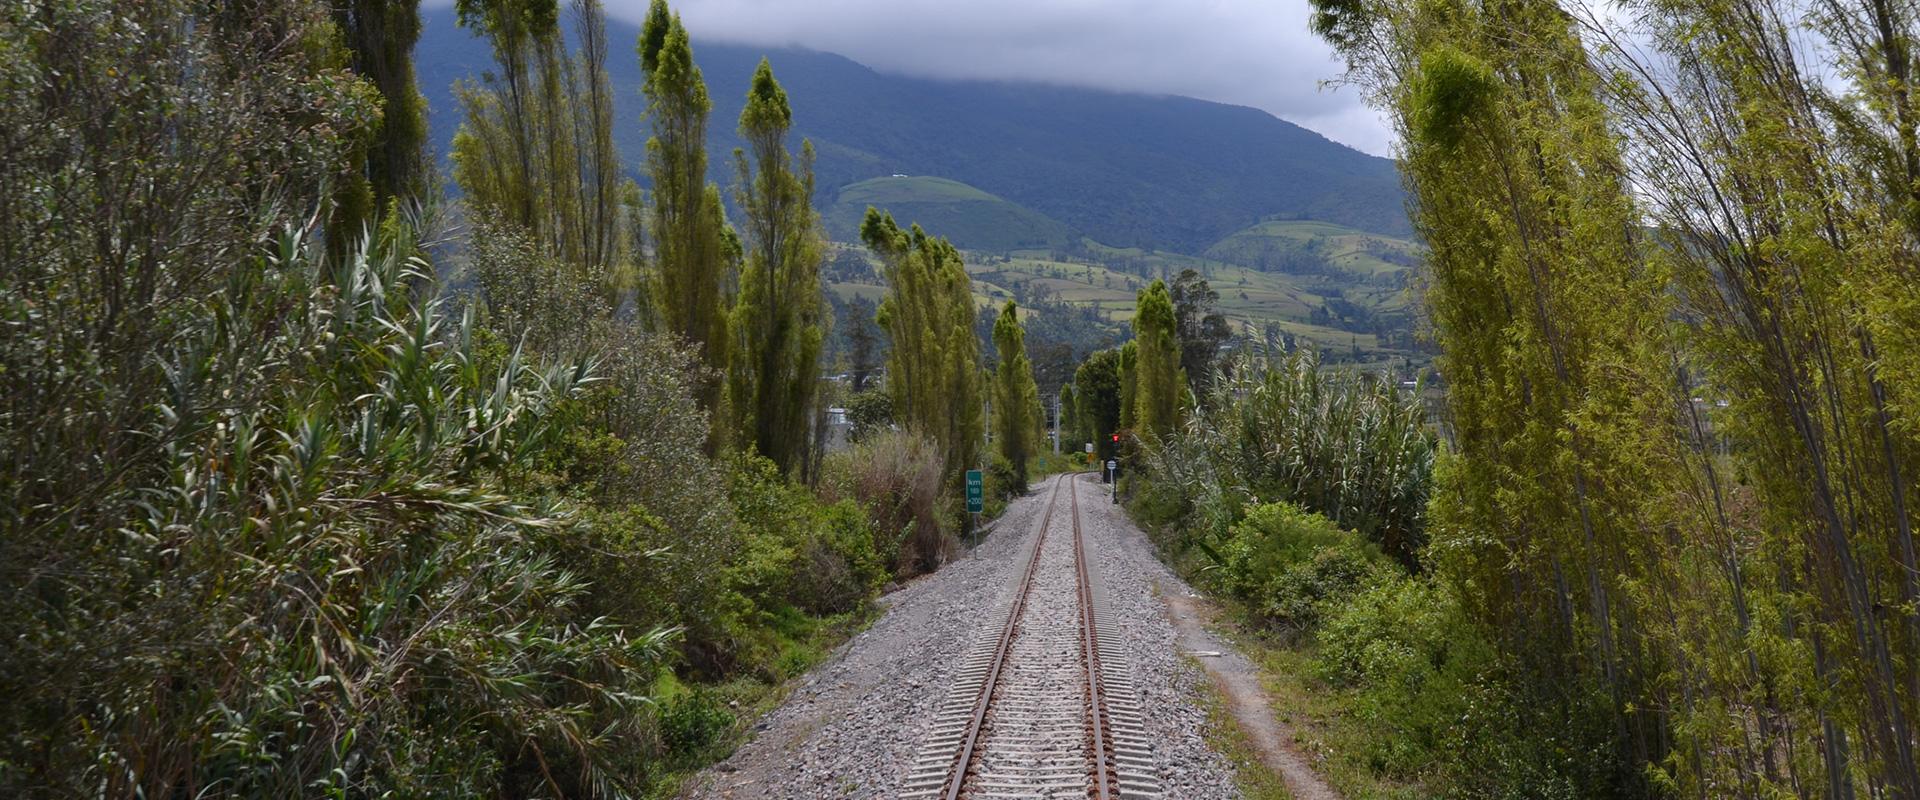 Ecuador Northern Train